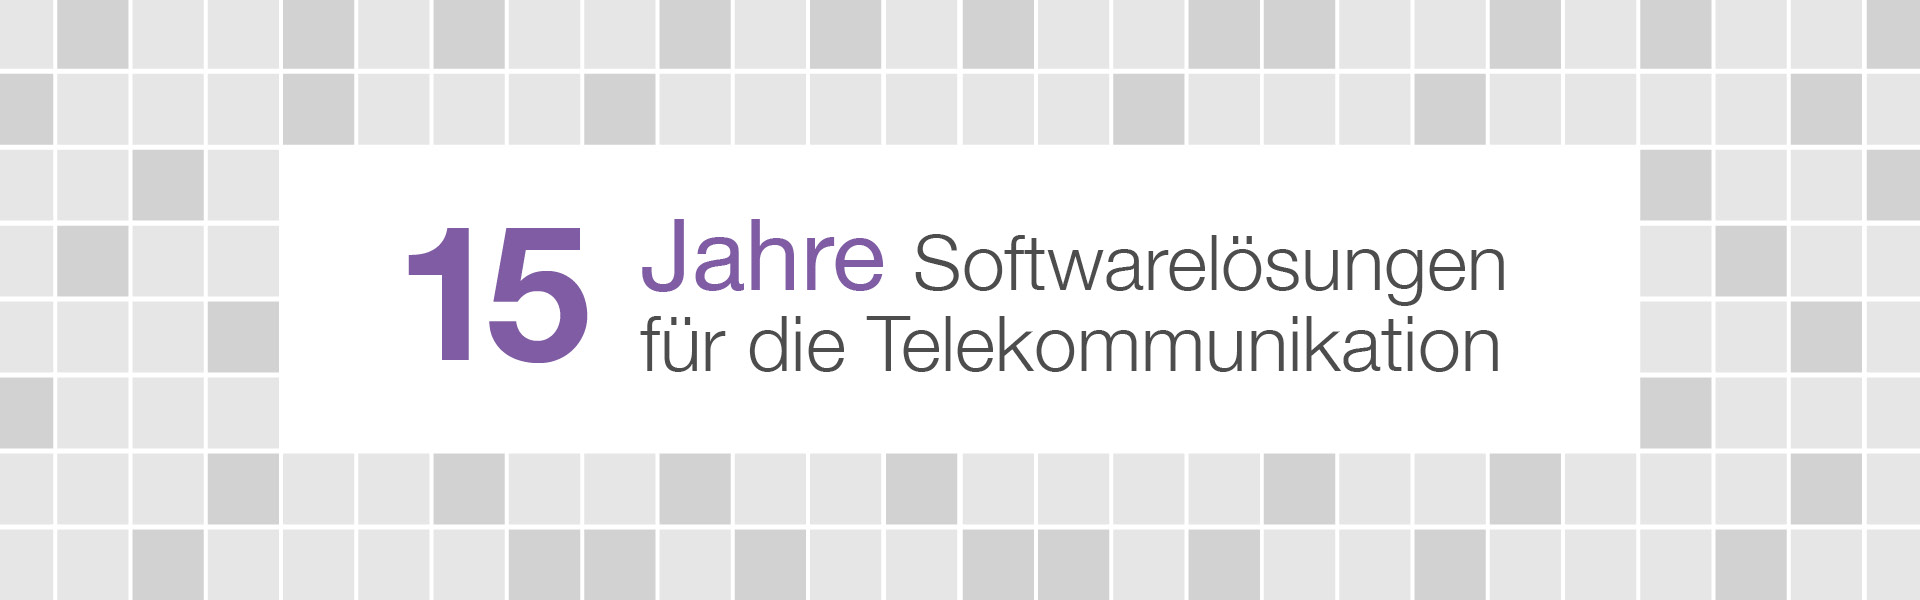 dimari-slider-Telekommunikation